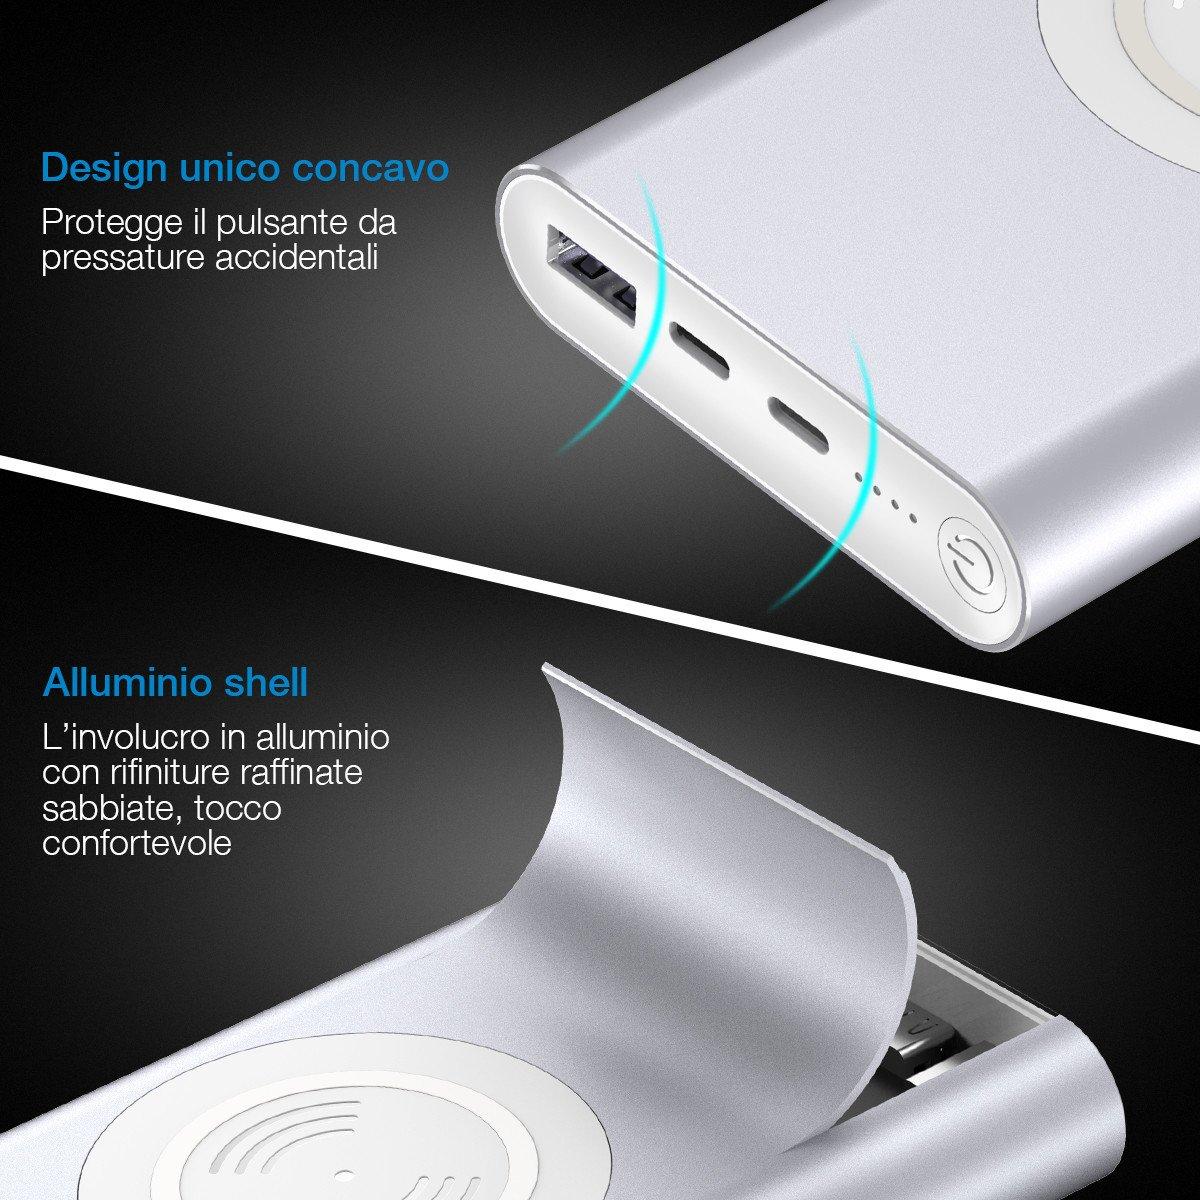 POWERADD Caricabatterie Senza Fili 10000mAh Entrata Lightning e Type-C, 2 Uscite con Ricarica Rapida da 3.4A Powerbank Wireless per iPhone X/ 8, Samsung Galaxy S9/ S8/ S7/ Note ecc. Argento